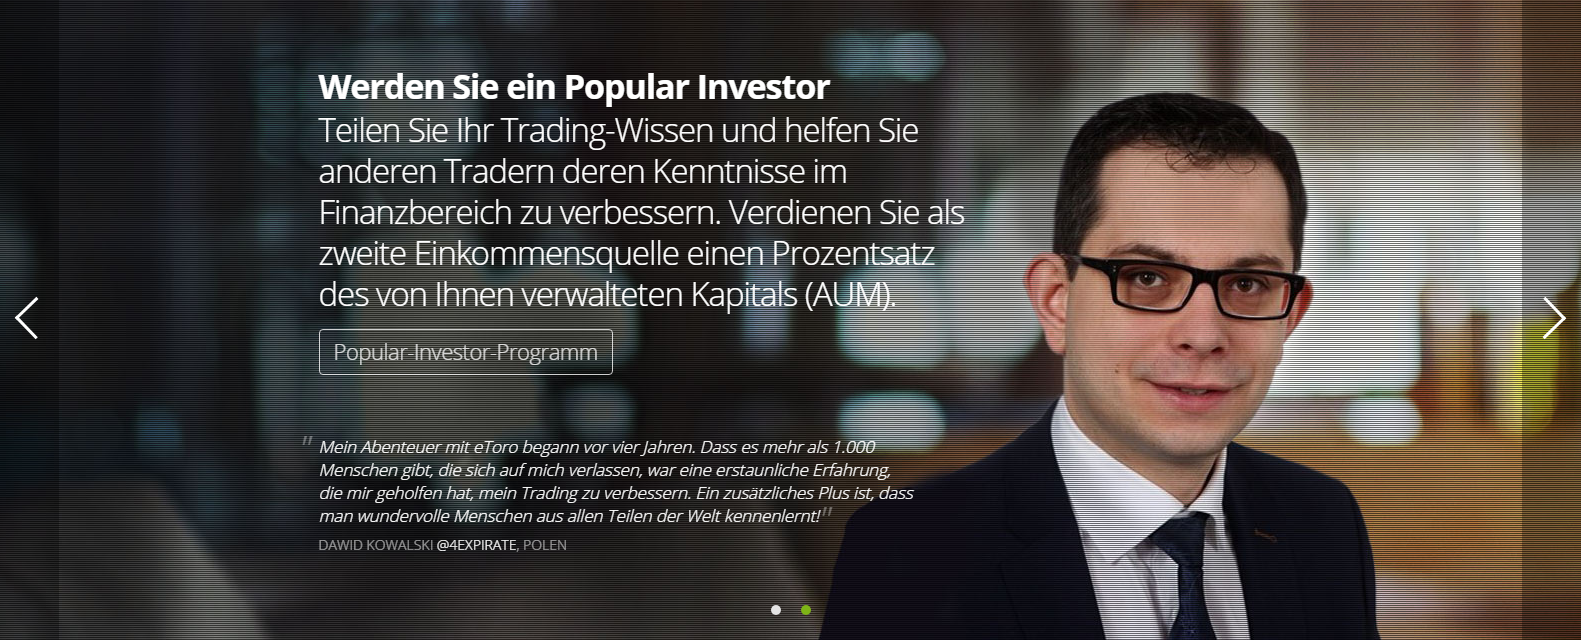 eToro Social Trading Erfahrungen